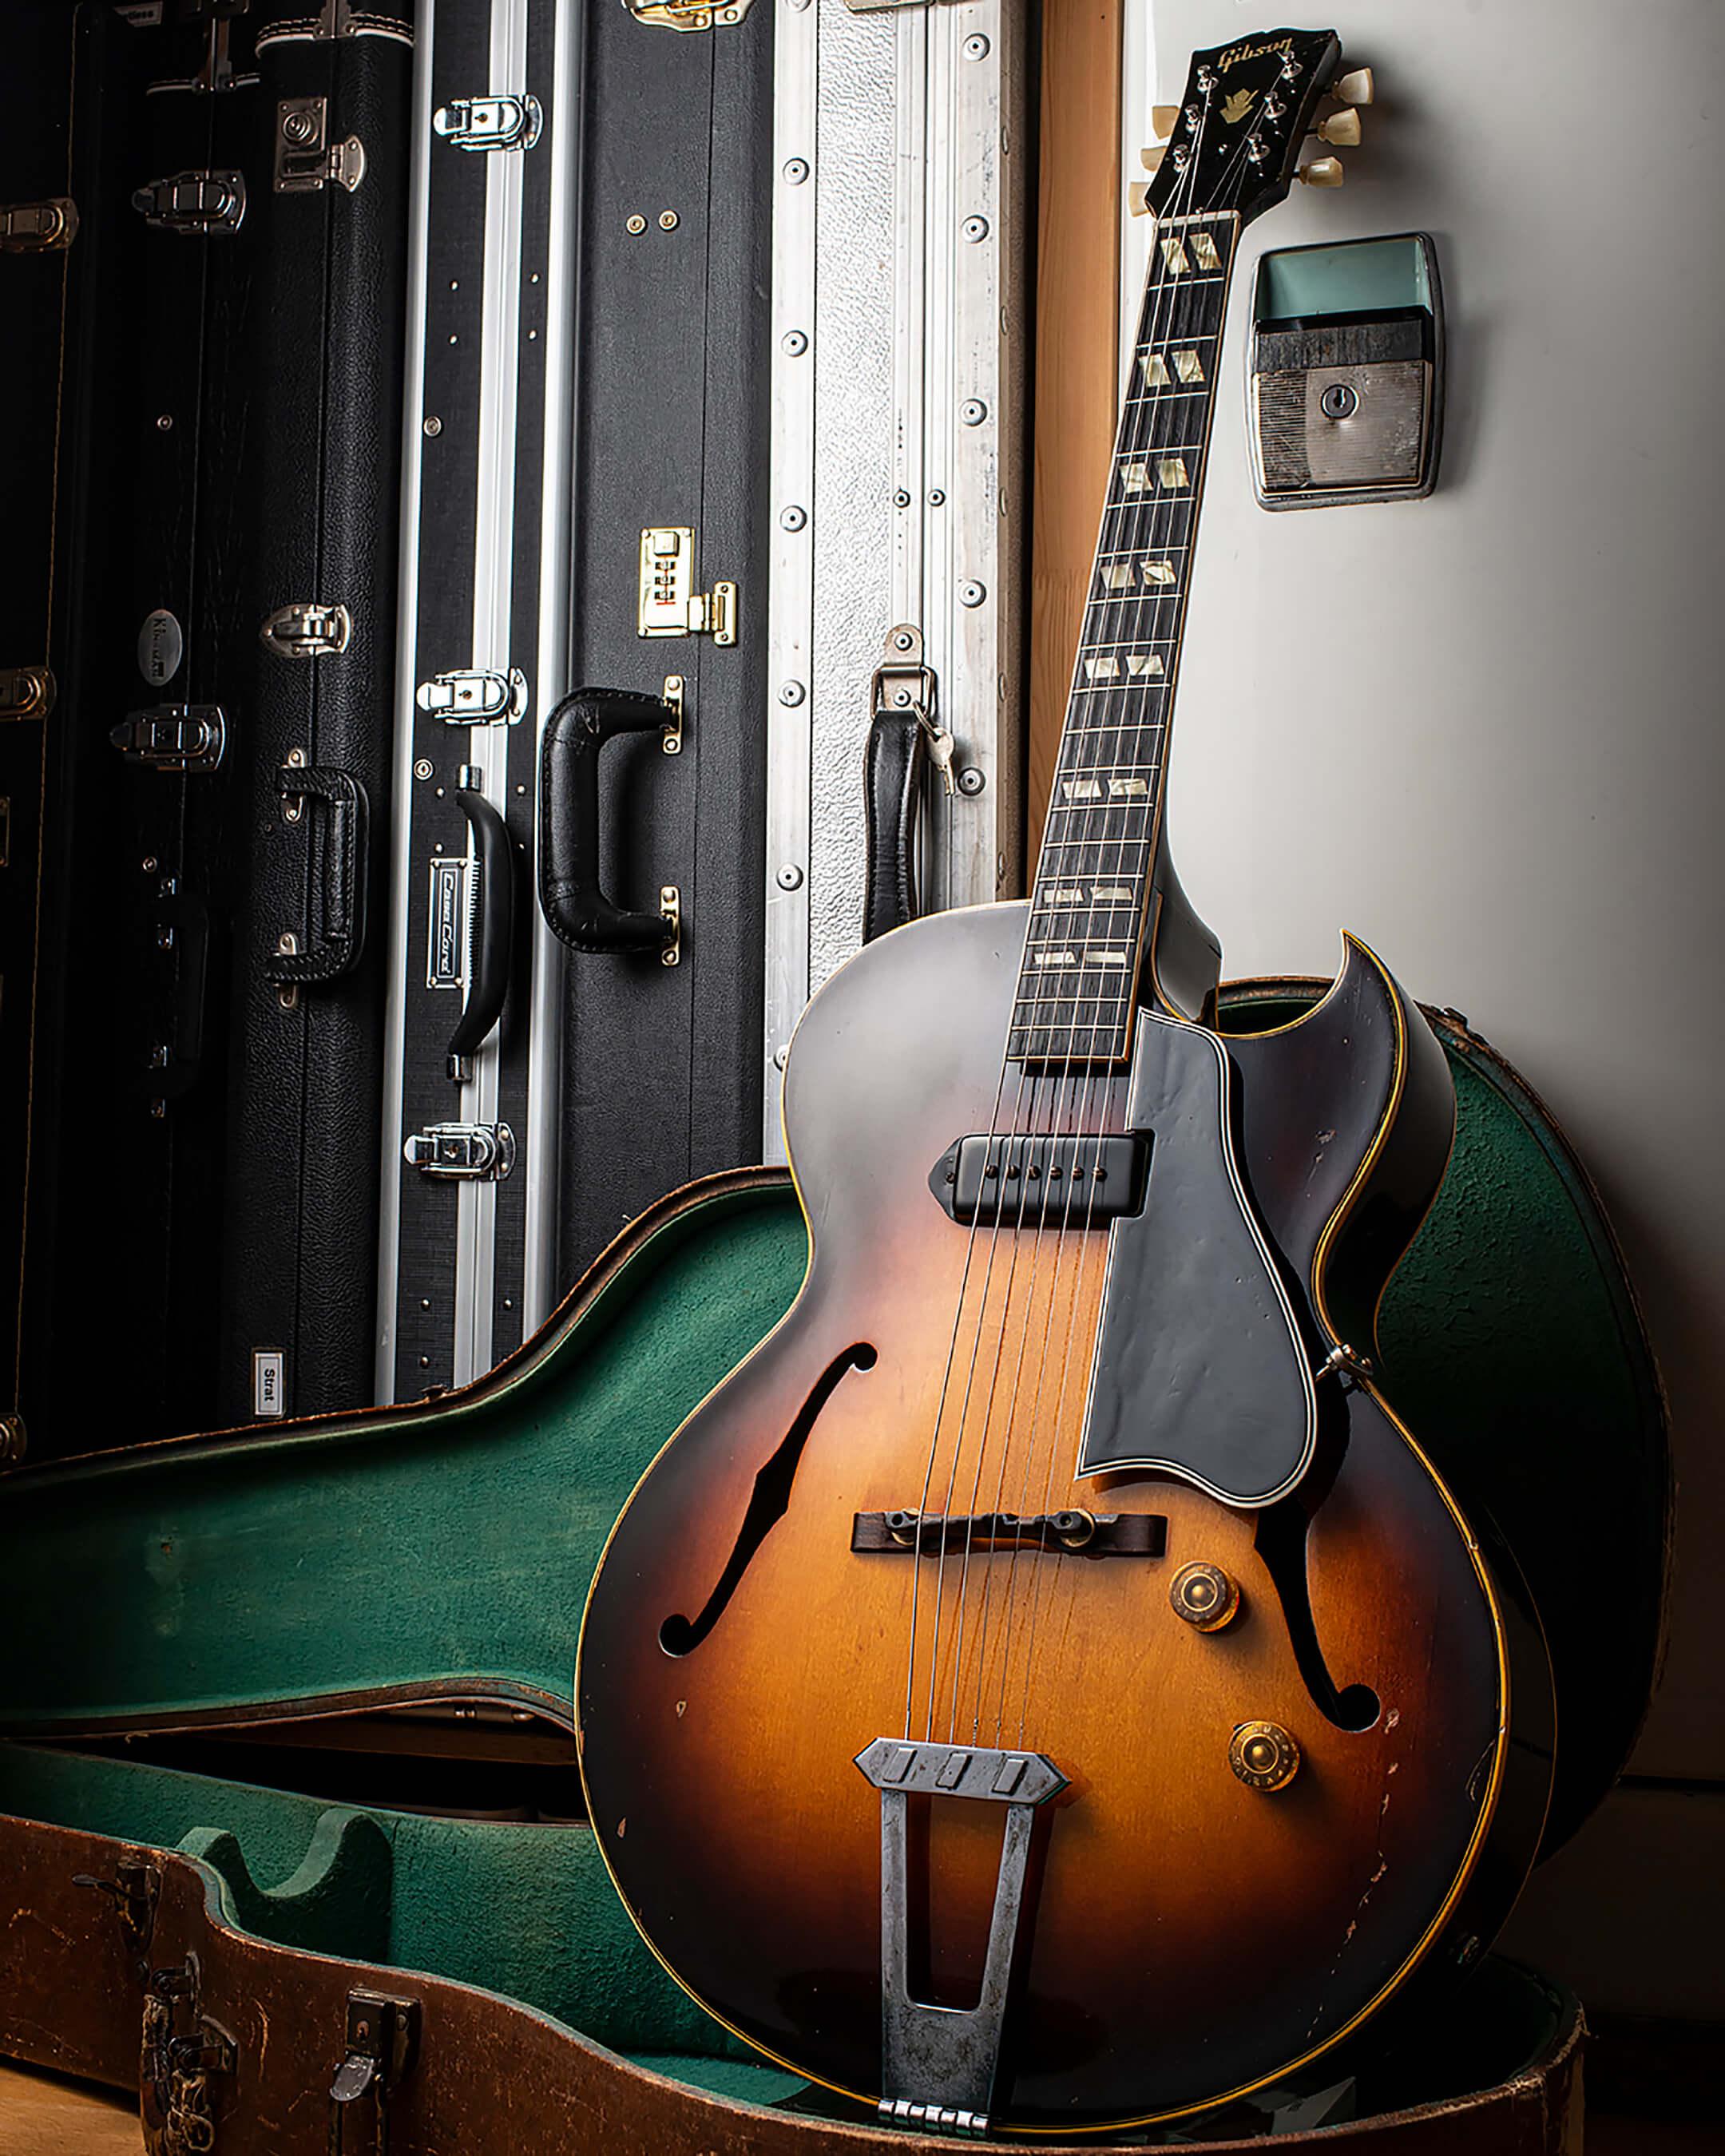 Bob Wootton's Gibson ES 175